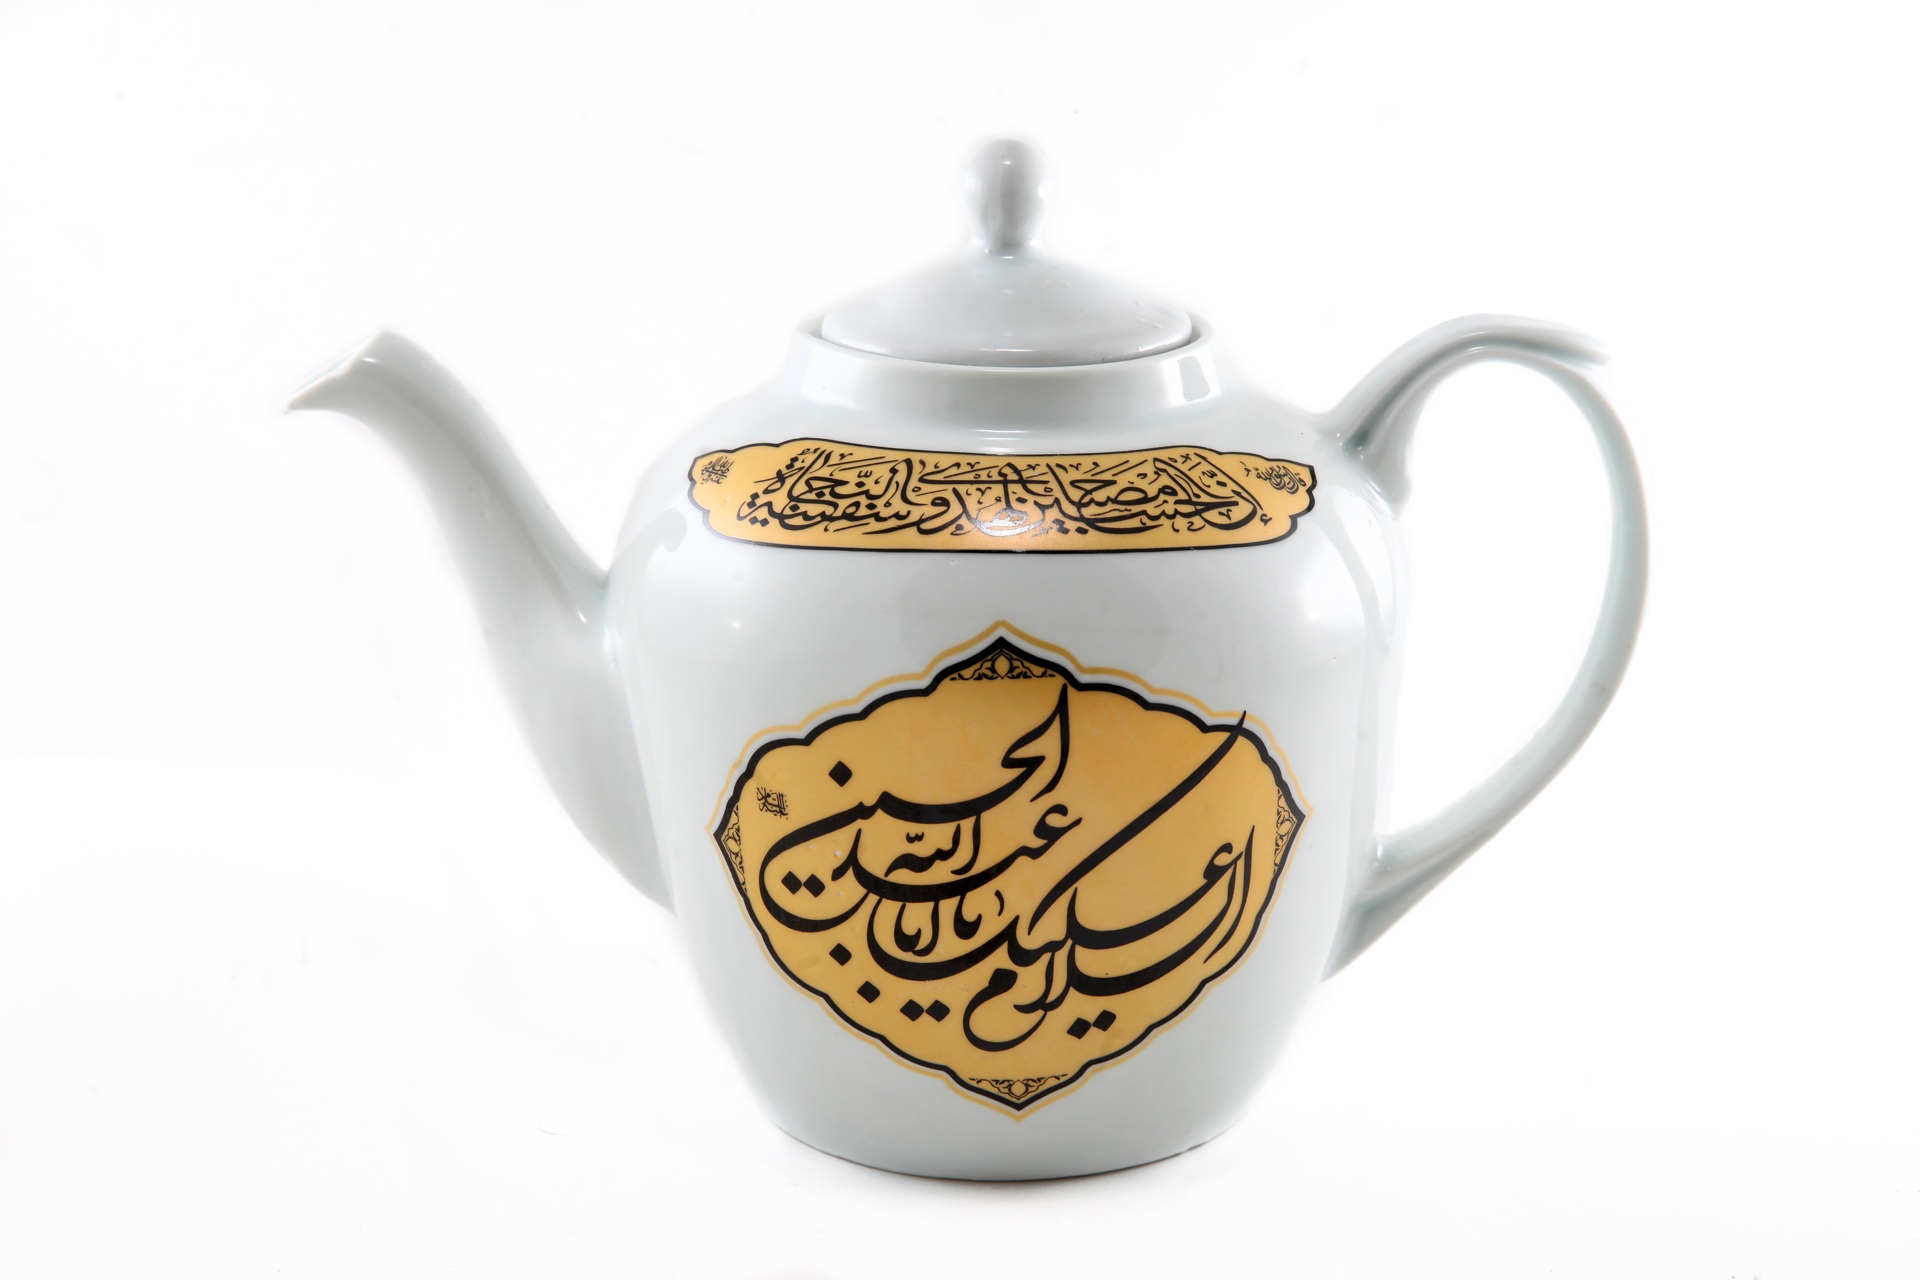 تصویر از قوری چایخانه با ذکر السلام علیک یا اباعبدالله الحسین (ع) و السلام علیک یا ابالفضل العباس(ع) 2/5 لیتری